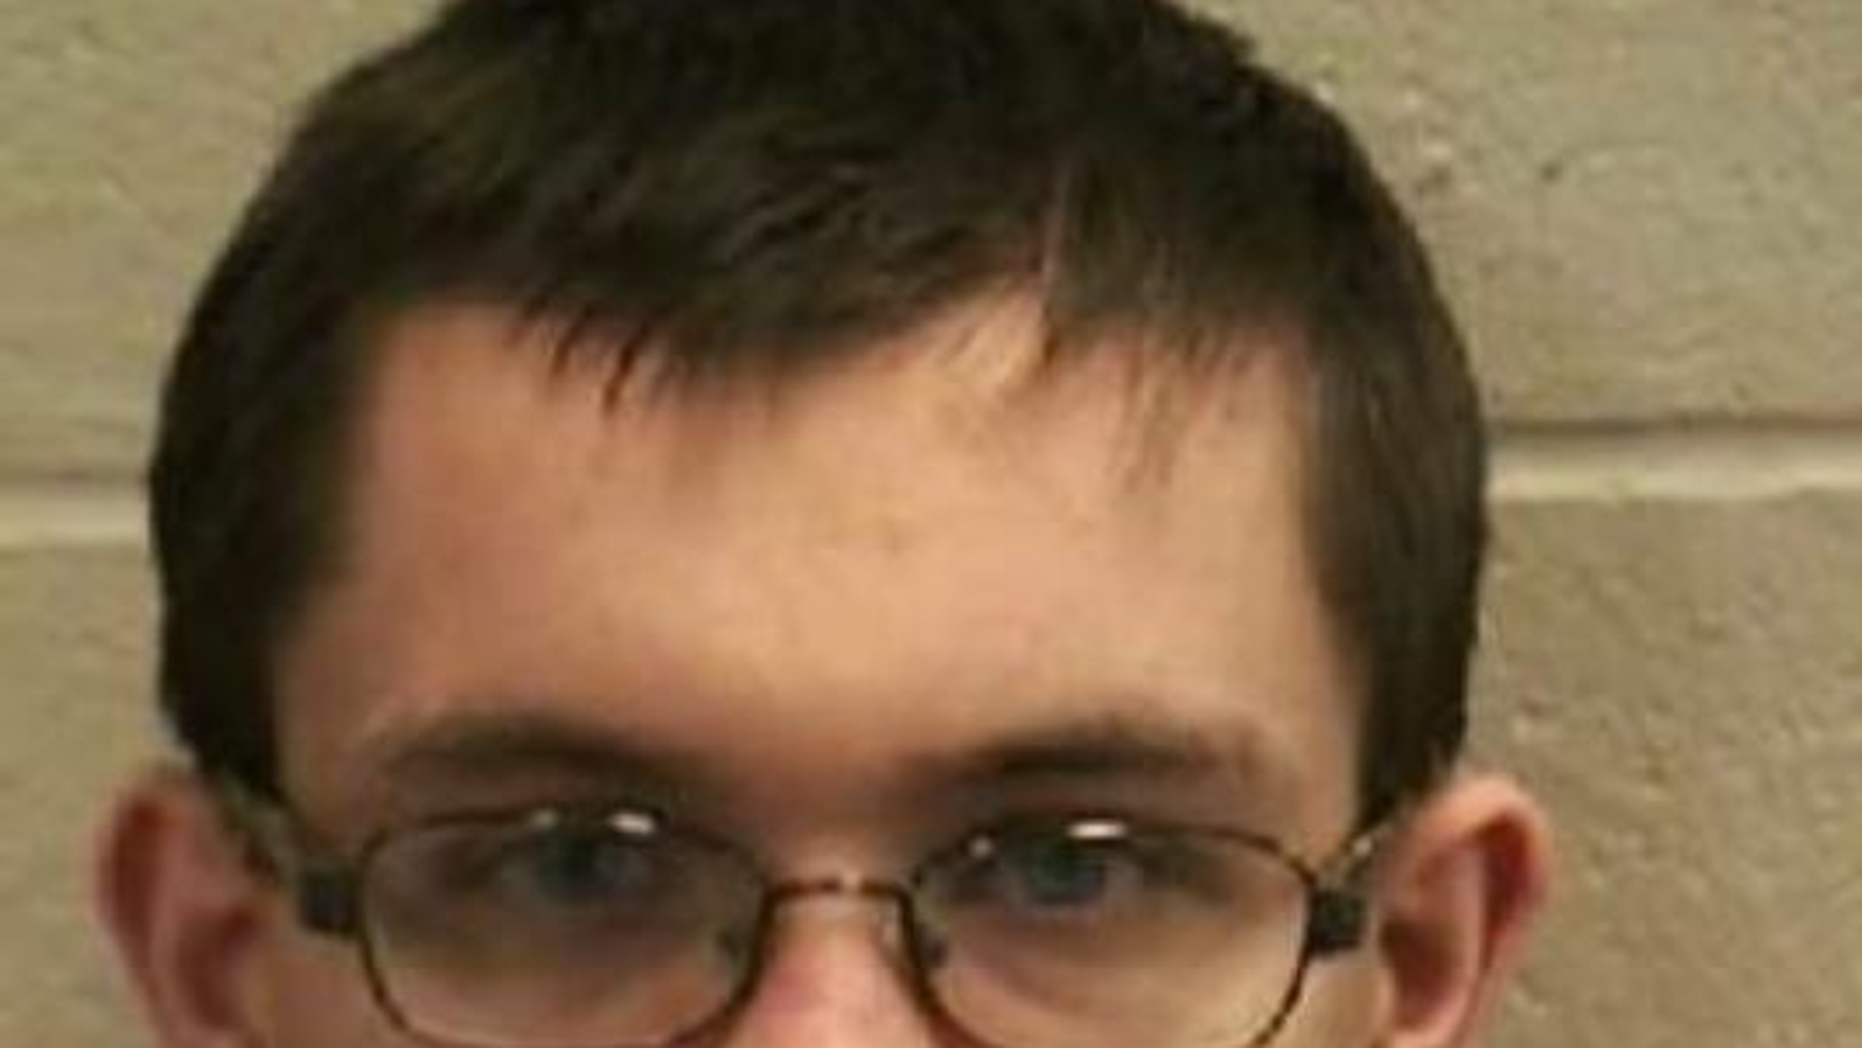 Richard A. Root, 21, of Oshkosh, Wis.